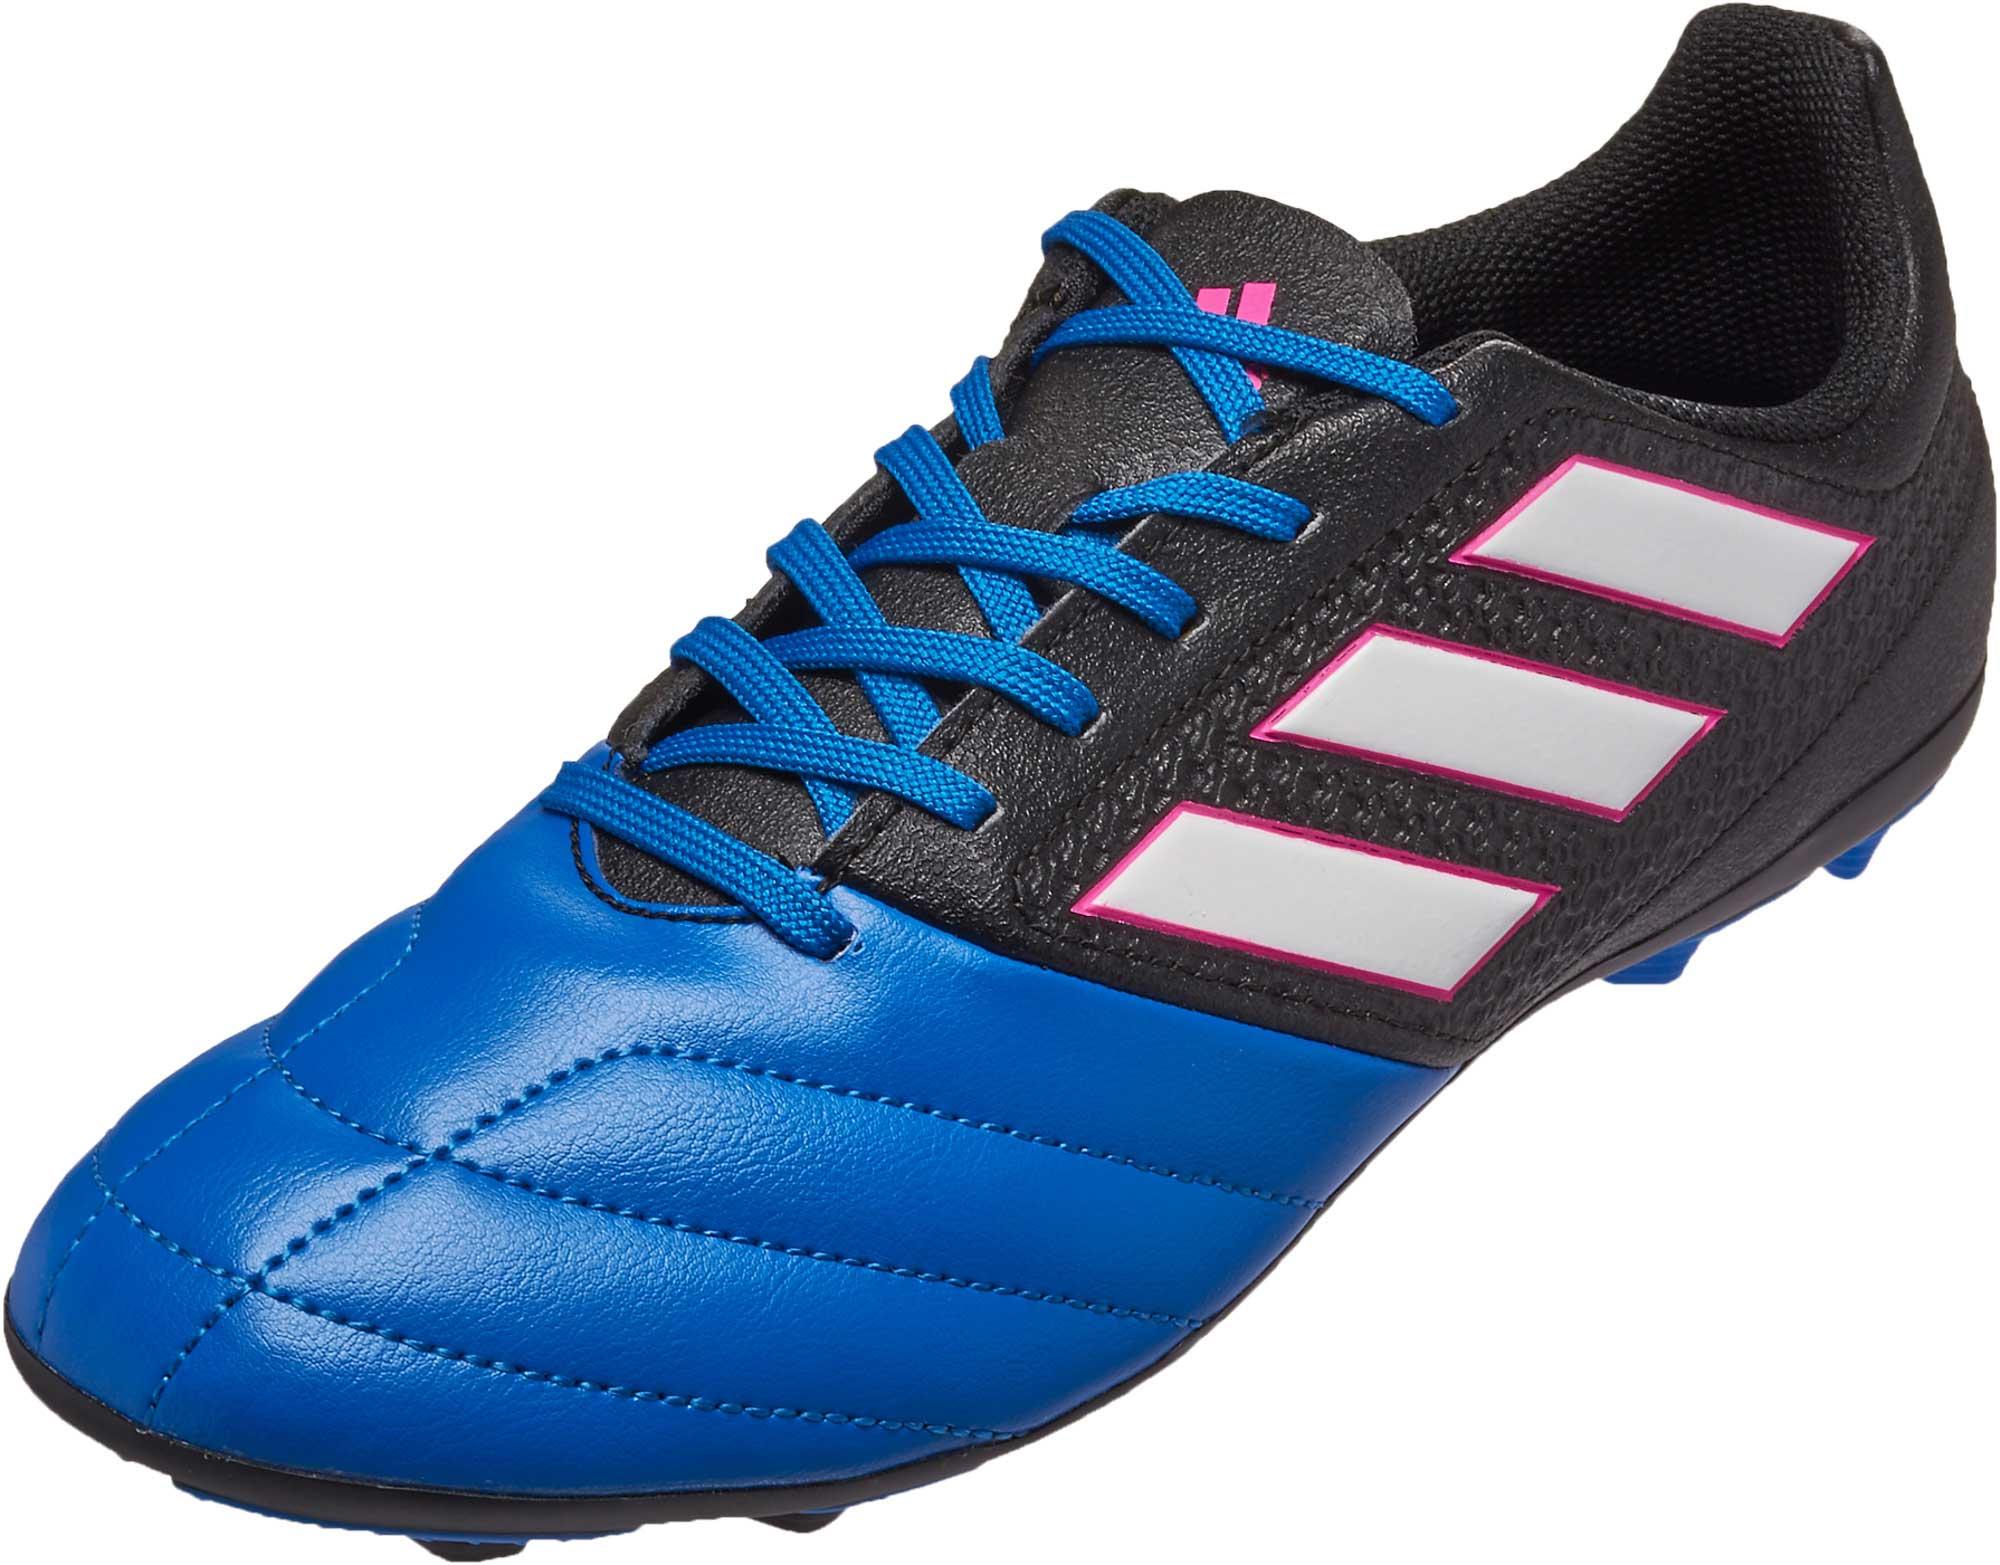 d20c3679782b adidas Kids ACE 17.4 FG Soccer Cleats - Black   Blue - Soccer Master